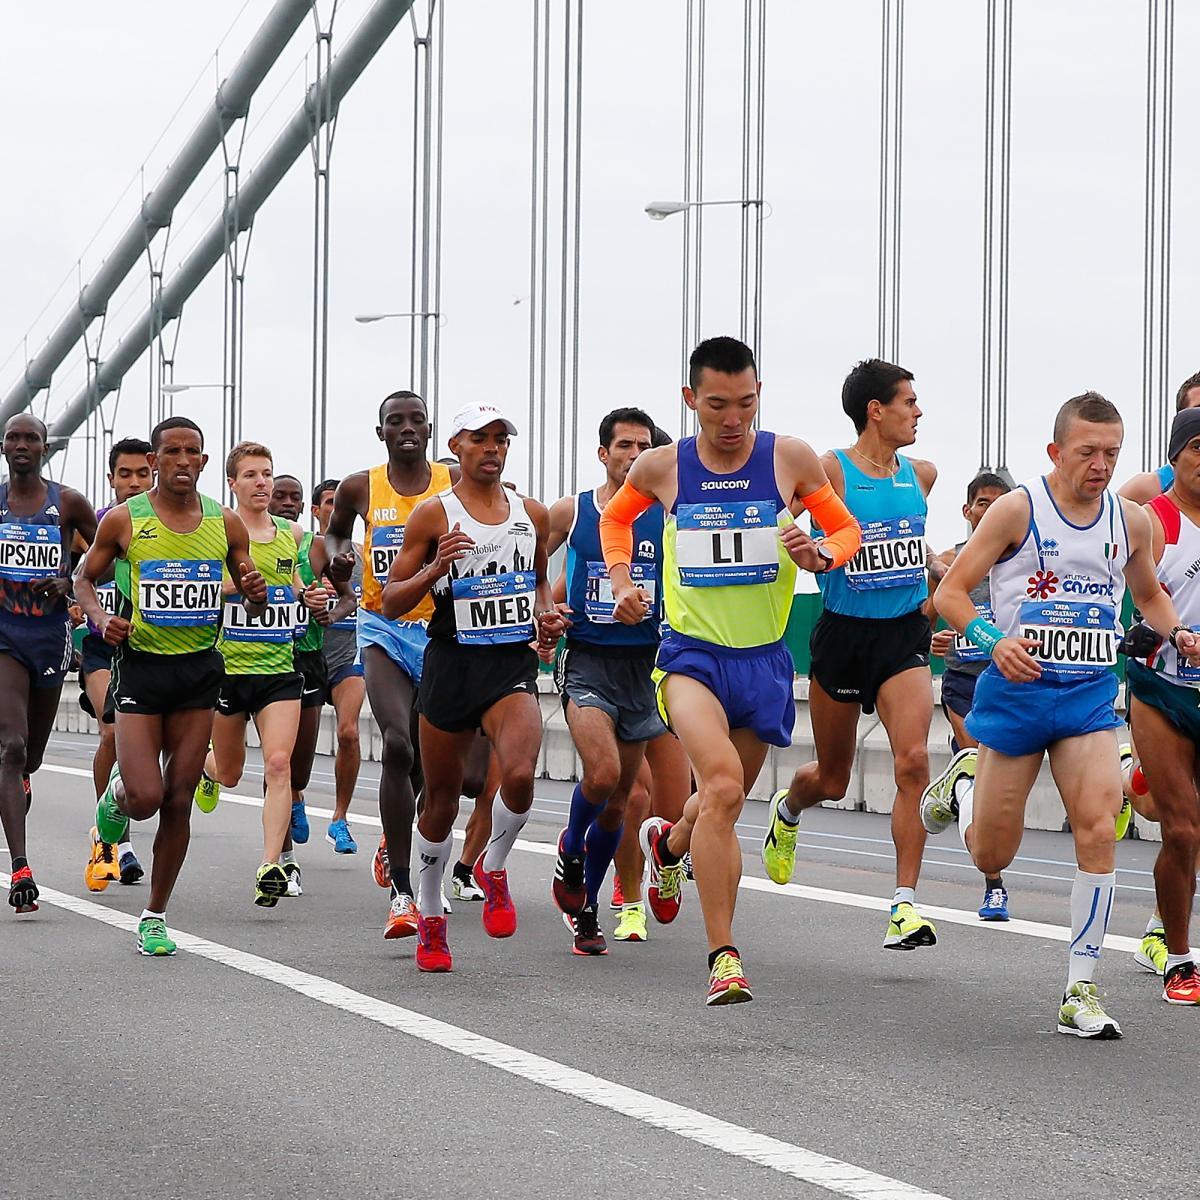 New York Marathon  Route Course Map Times Road Closures - Nyc marathon course map pdf